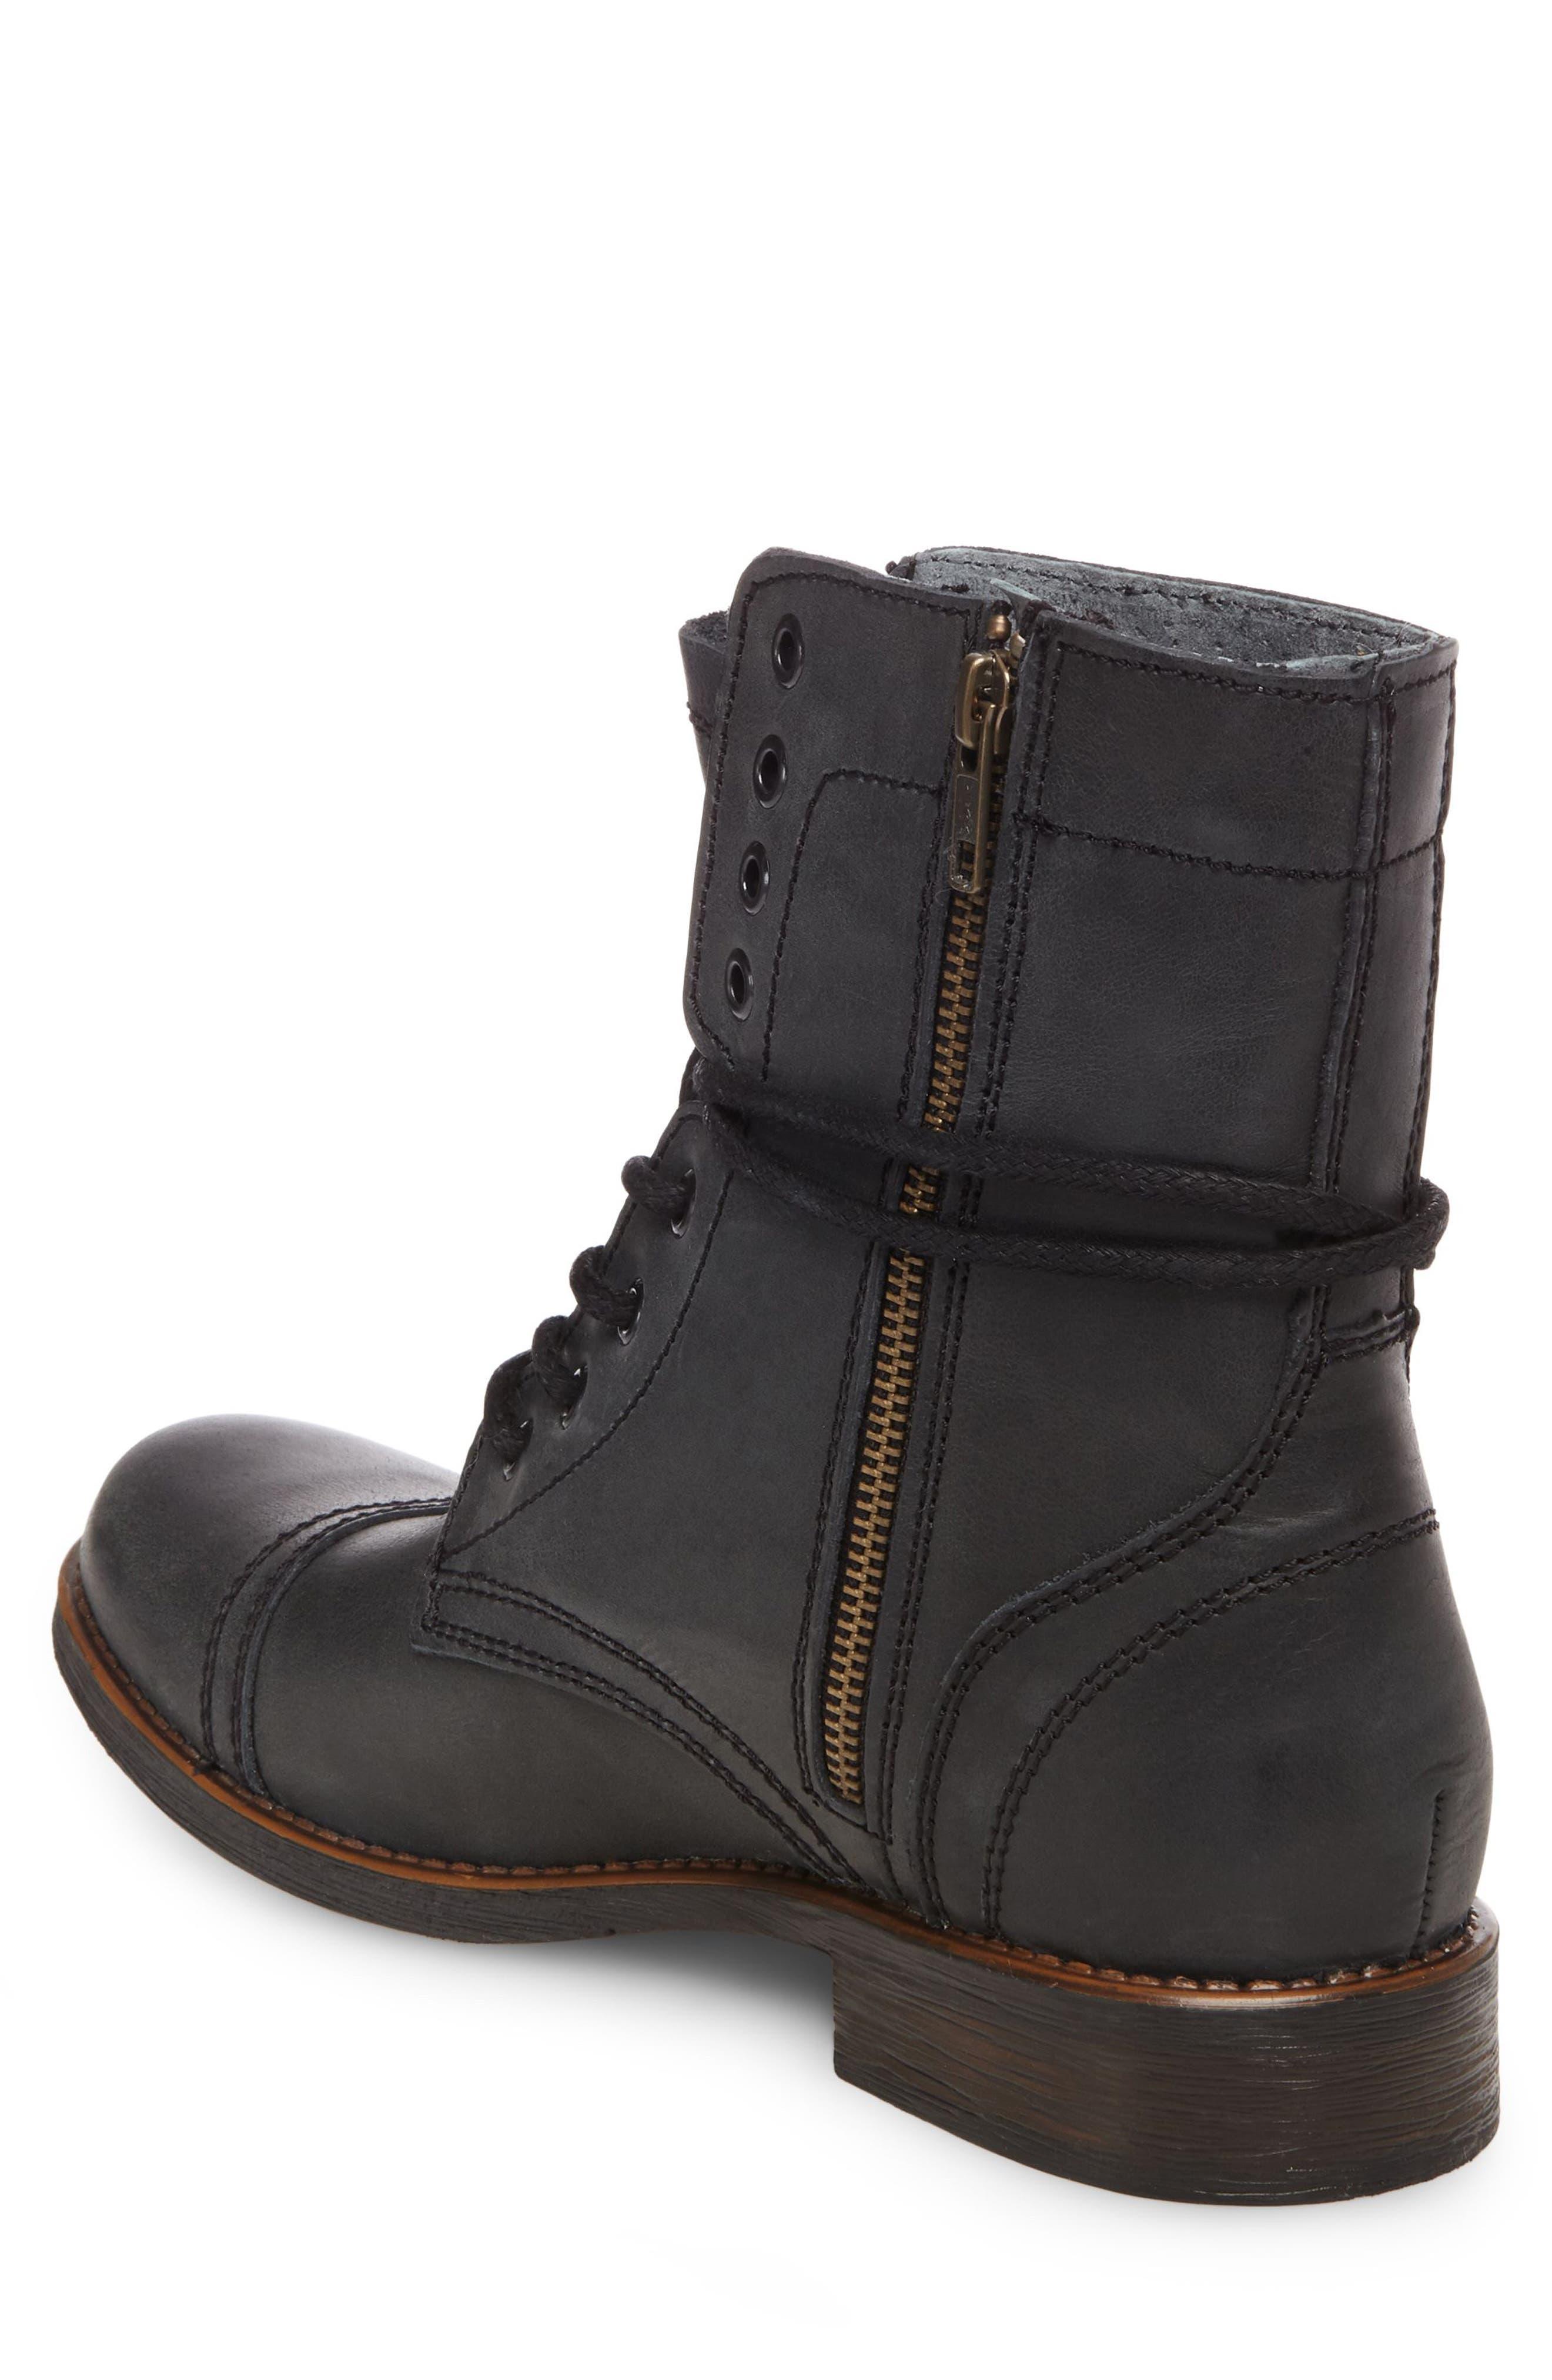 Troopah-C Cap Toe Boot,                             Alternate thumbnail 2, color,                             Black Leather